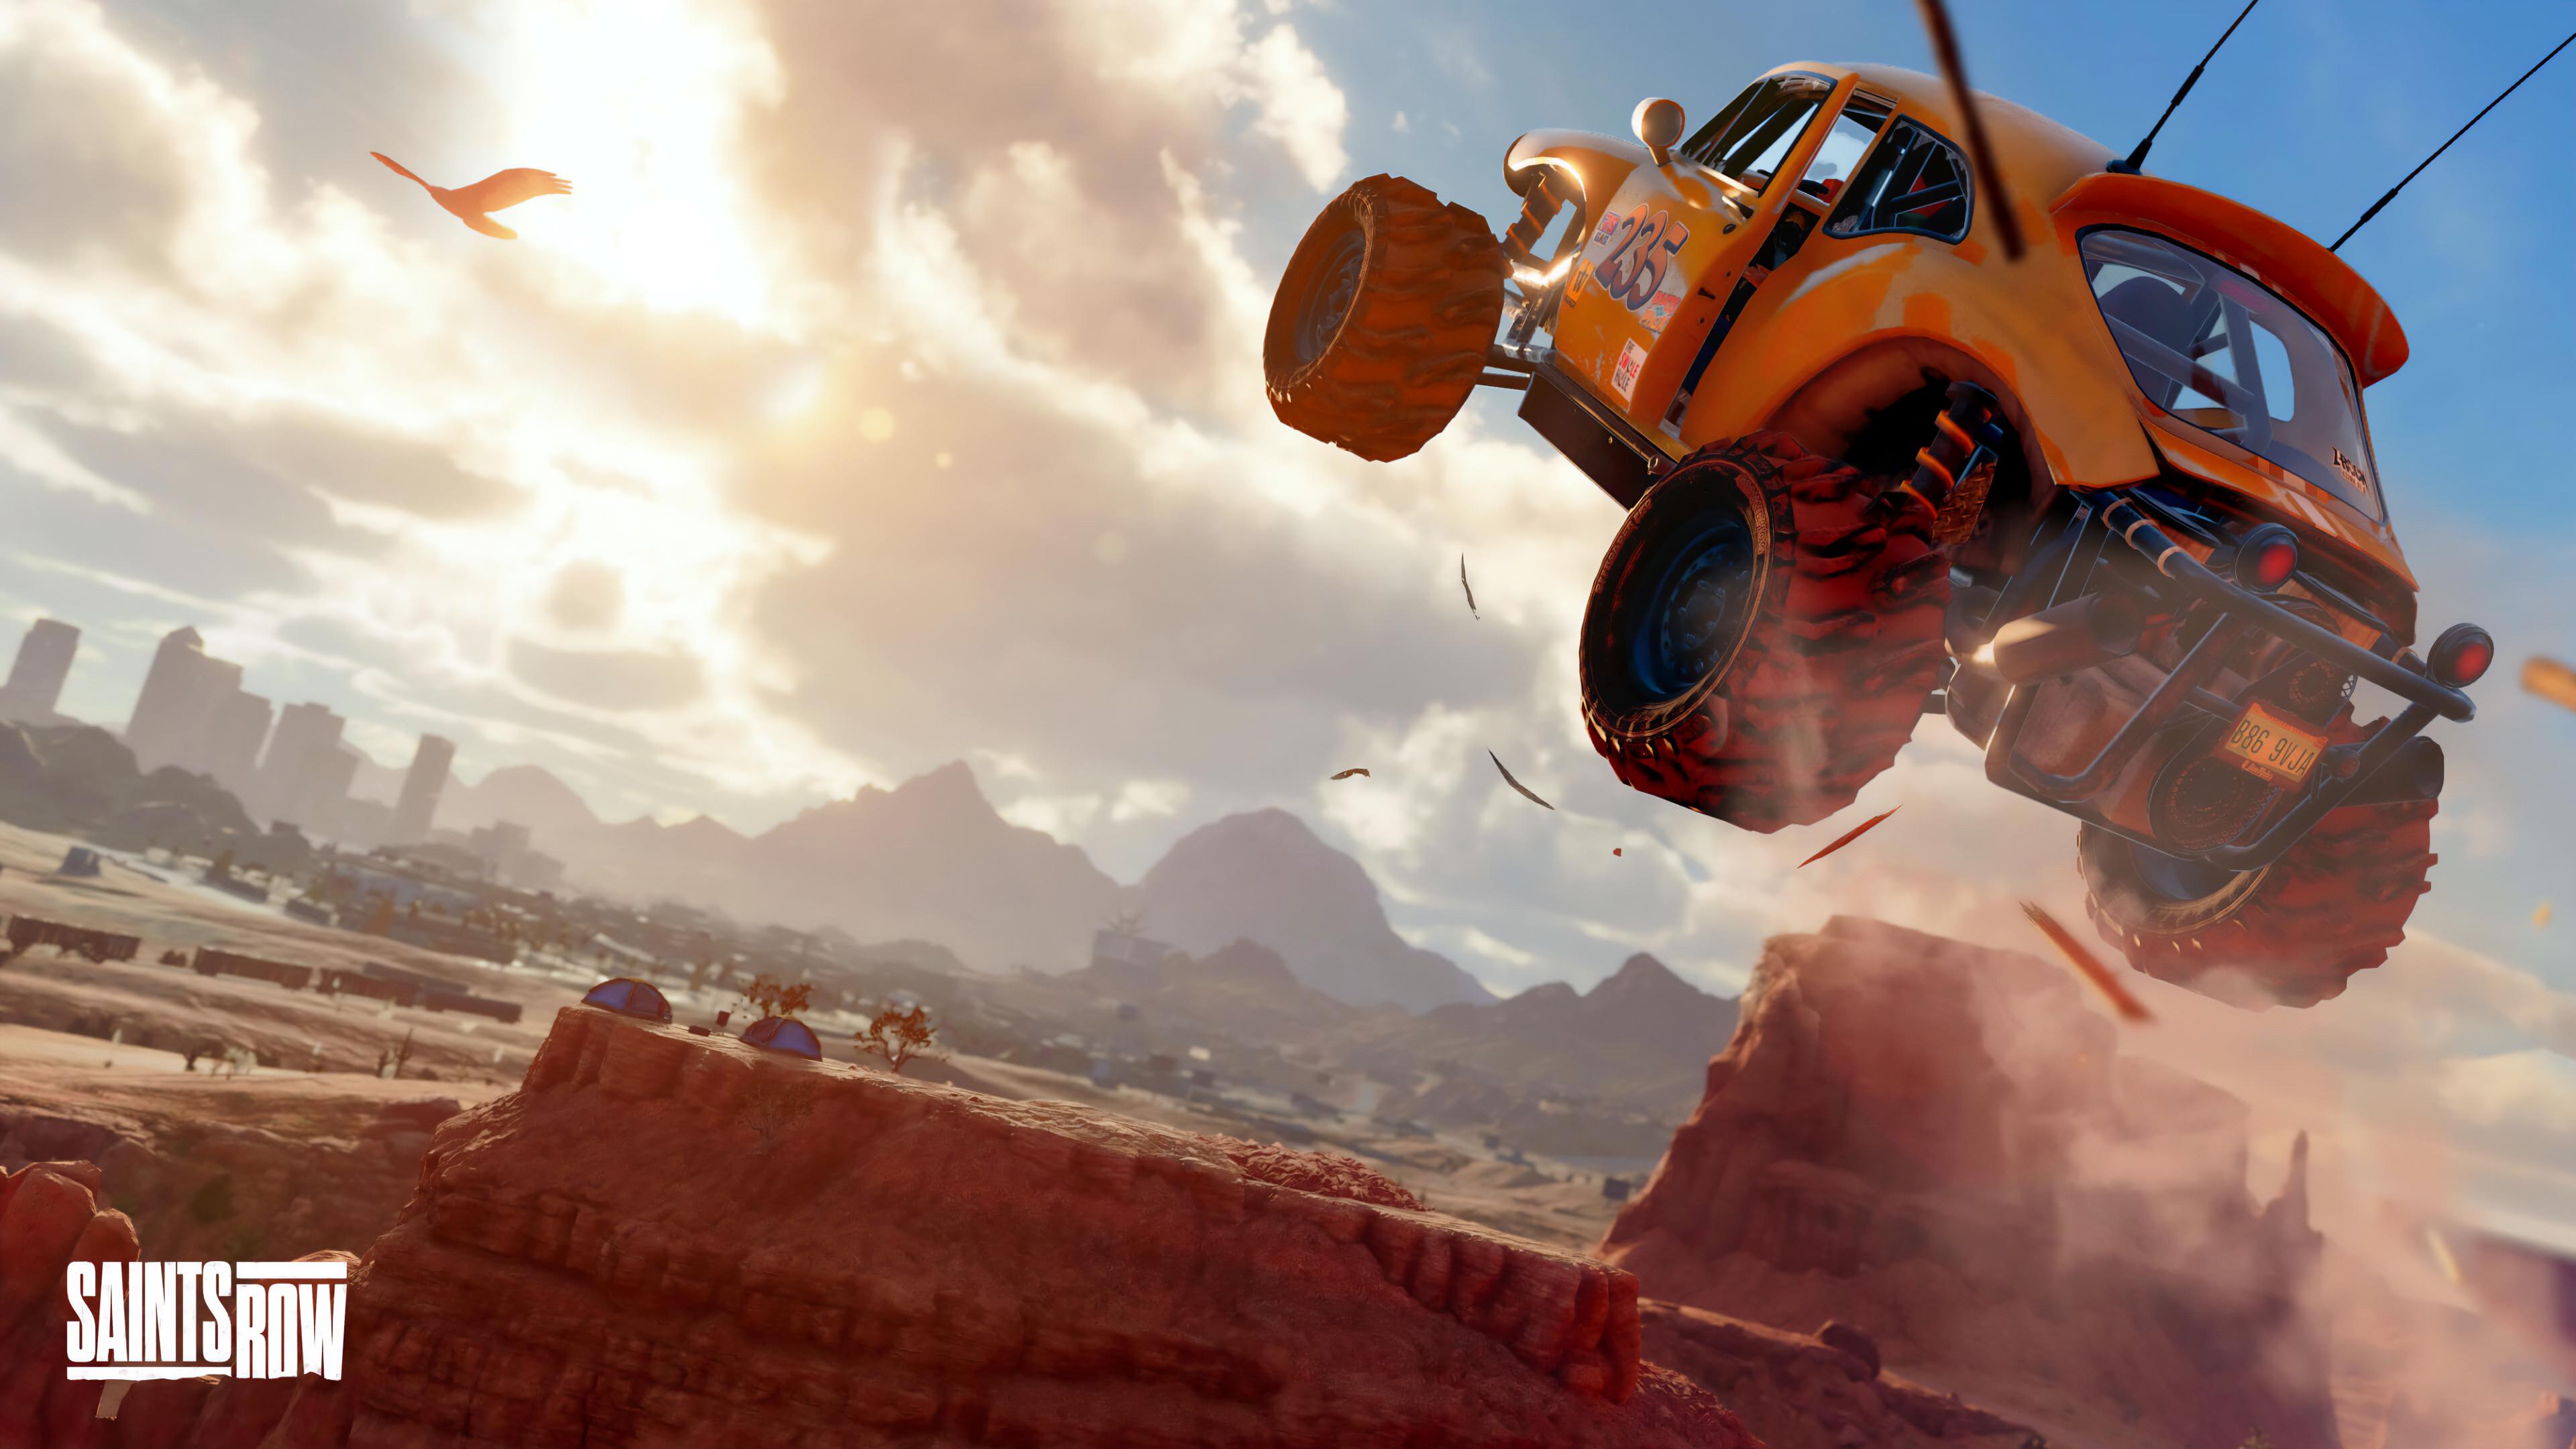 General 3840x2160 Saints Row Saints Row: Reboot buggy 4K Volition, Inc. video games PC gaming vehicle car orange cars jumping